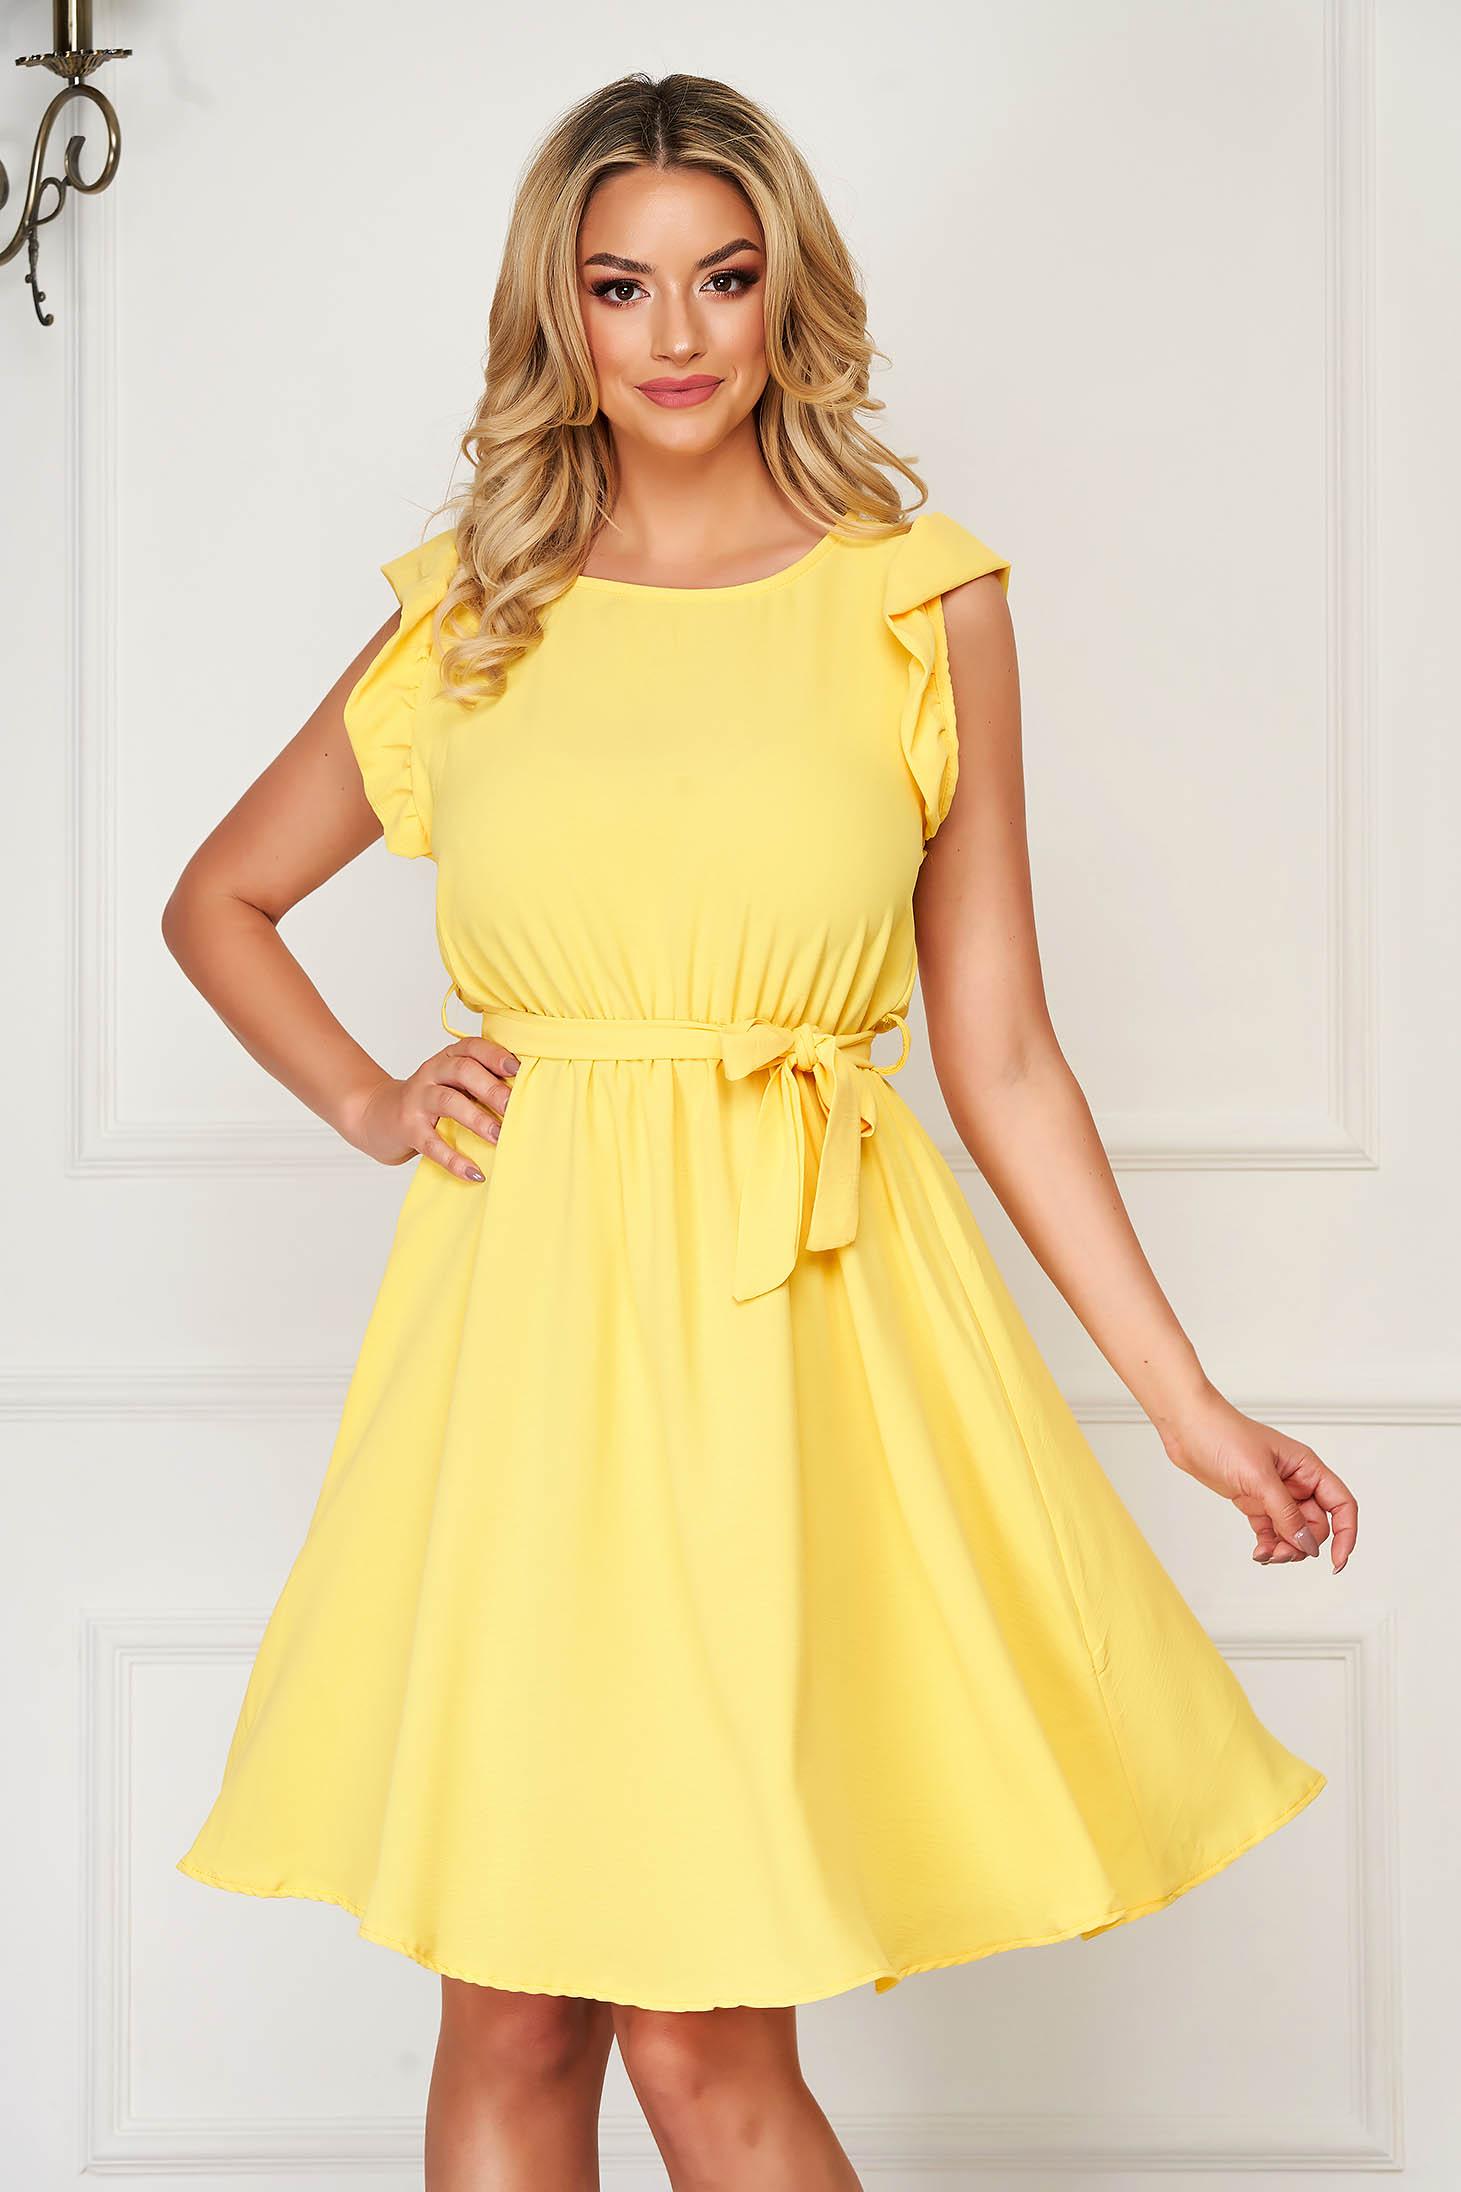 Yellow dress daily short cut sleeveless thin fabric